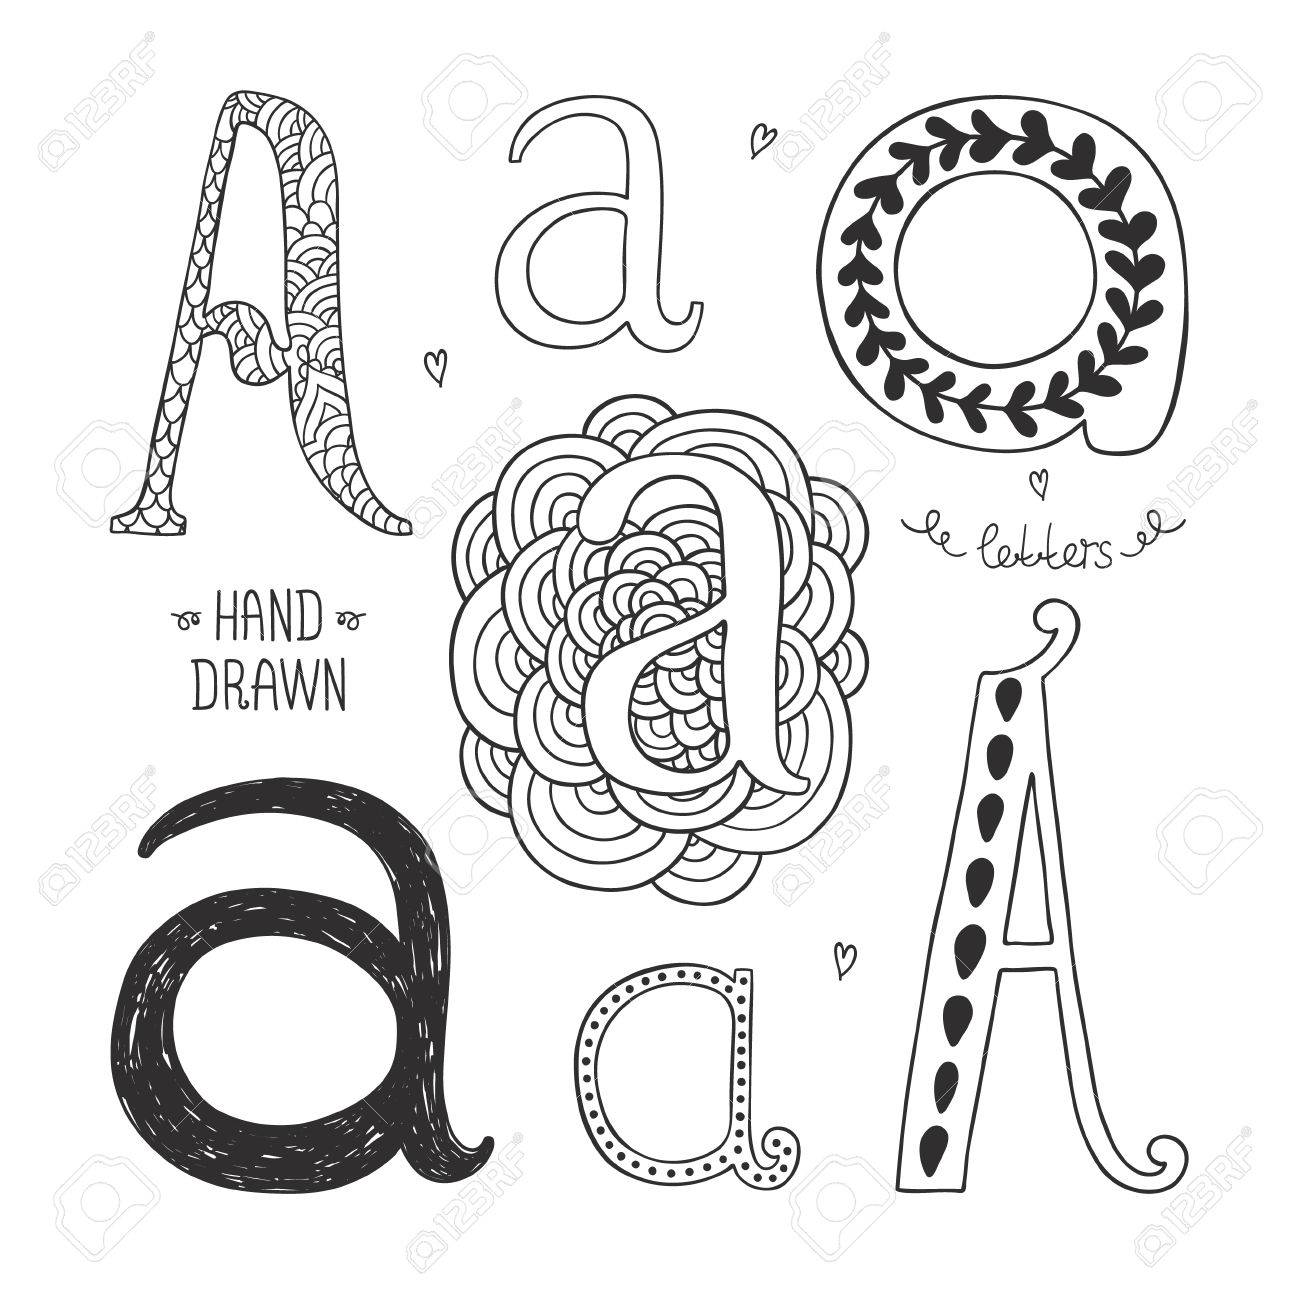 Vector hand drawn alphabet letter a doodle letters set isolated vector vector hand drawn alphabet letter a doodle letters set isolated on white background altavistaventures Images